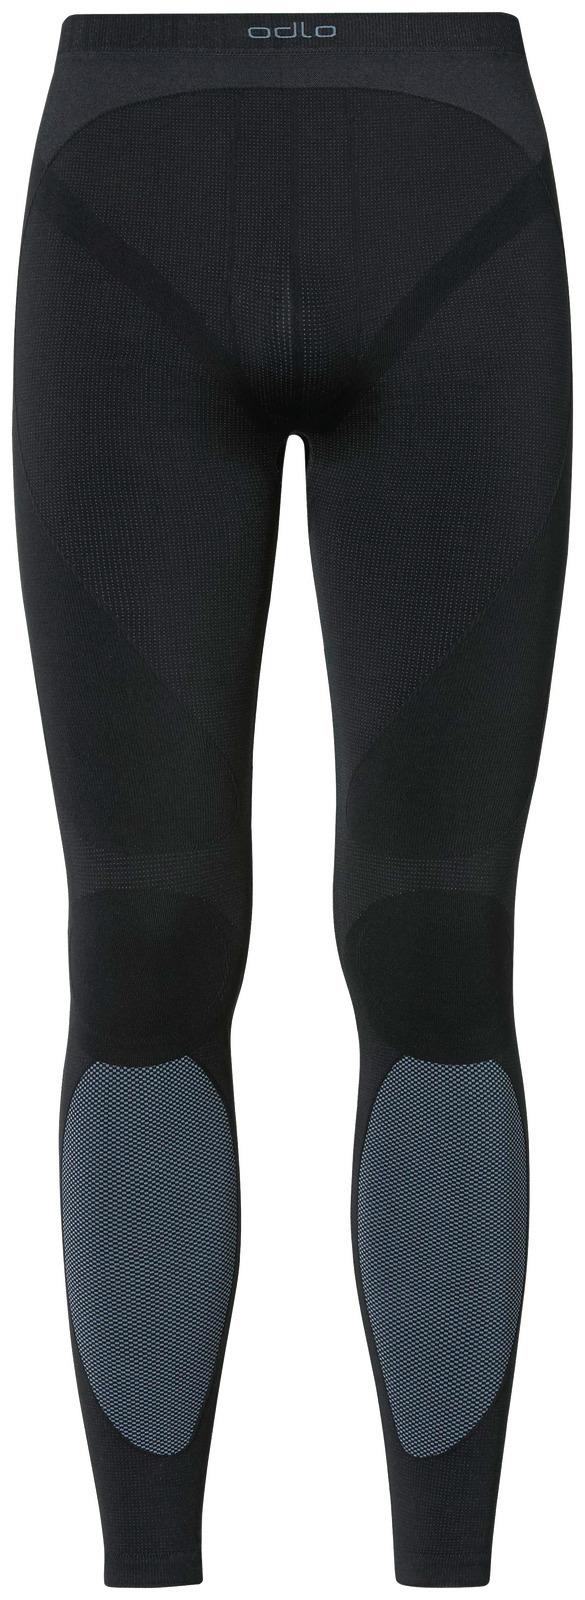 Odlo Men Pants Long Evolution Warm Black (XL)